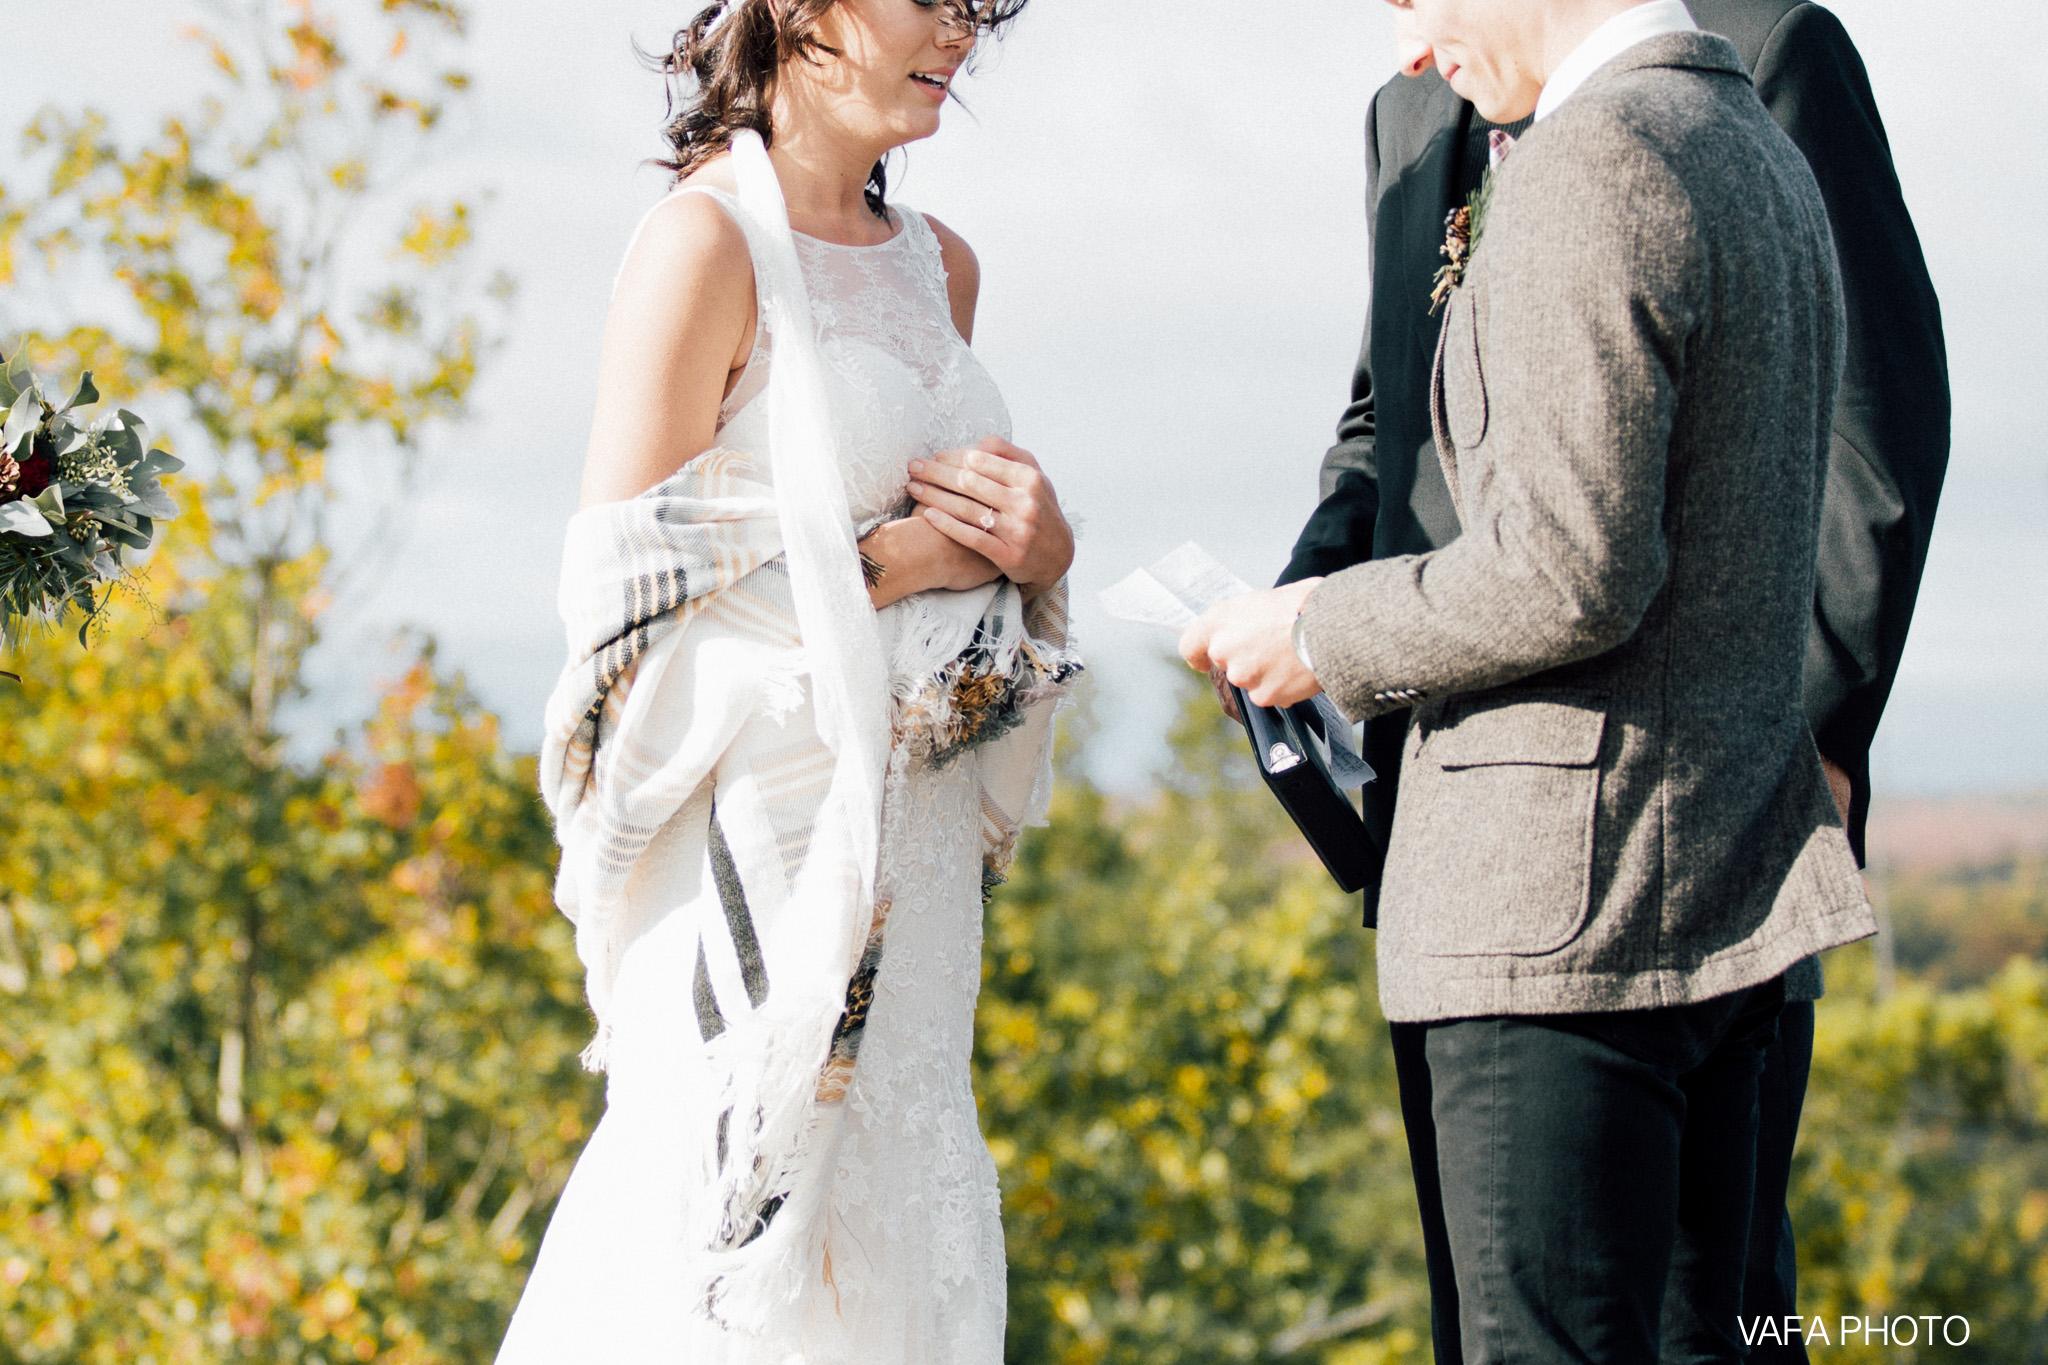 Hogback-Mountain-Wedding-Chelsea-Josh-Vafa-Photo-205.jpg